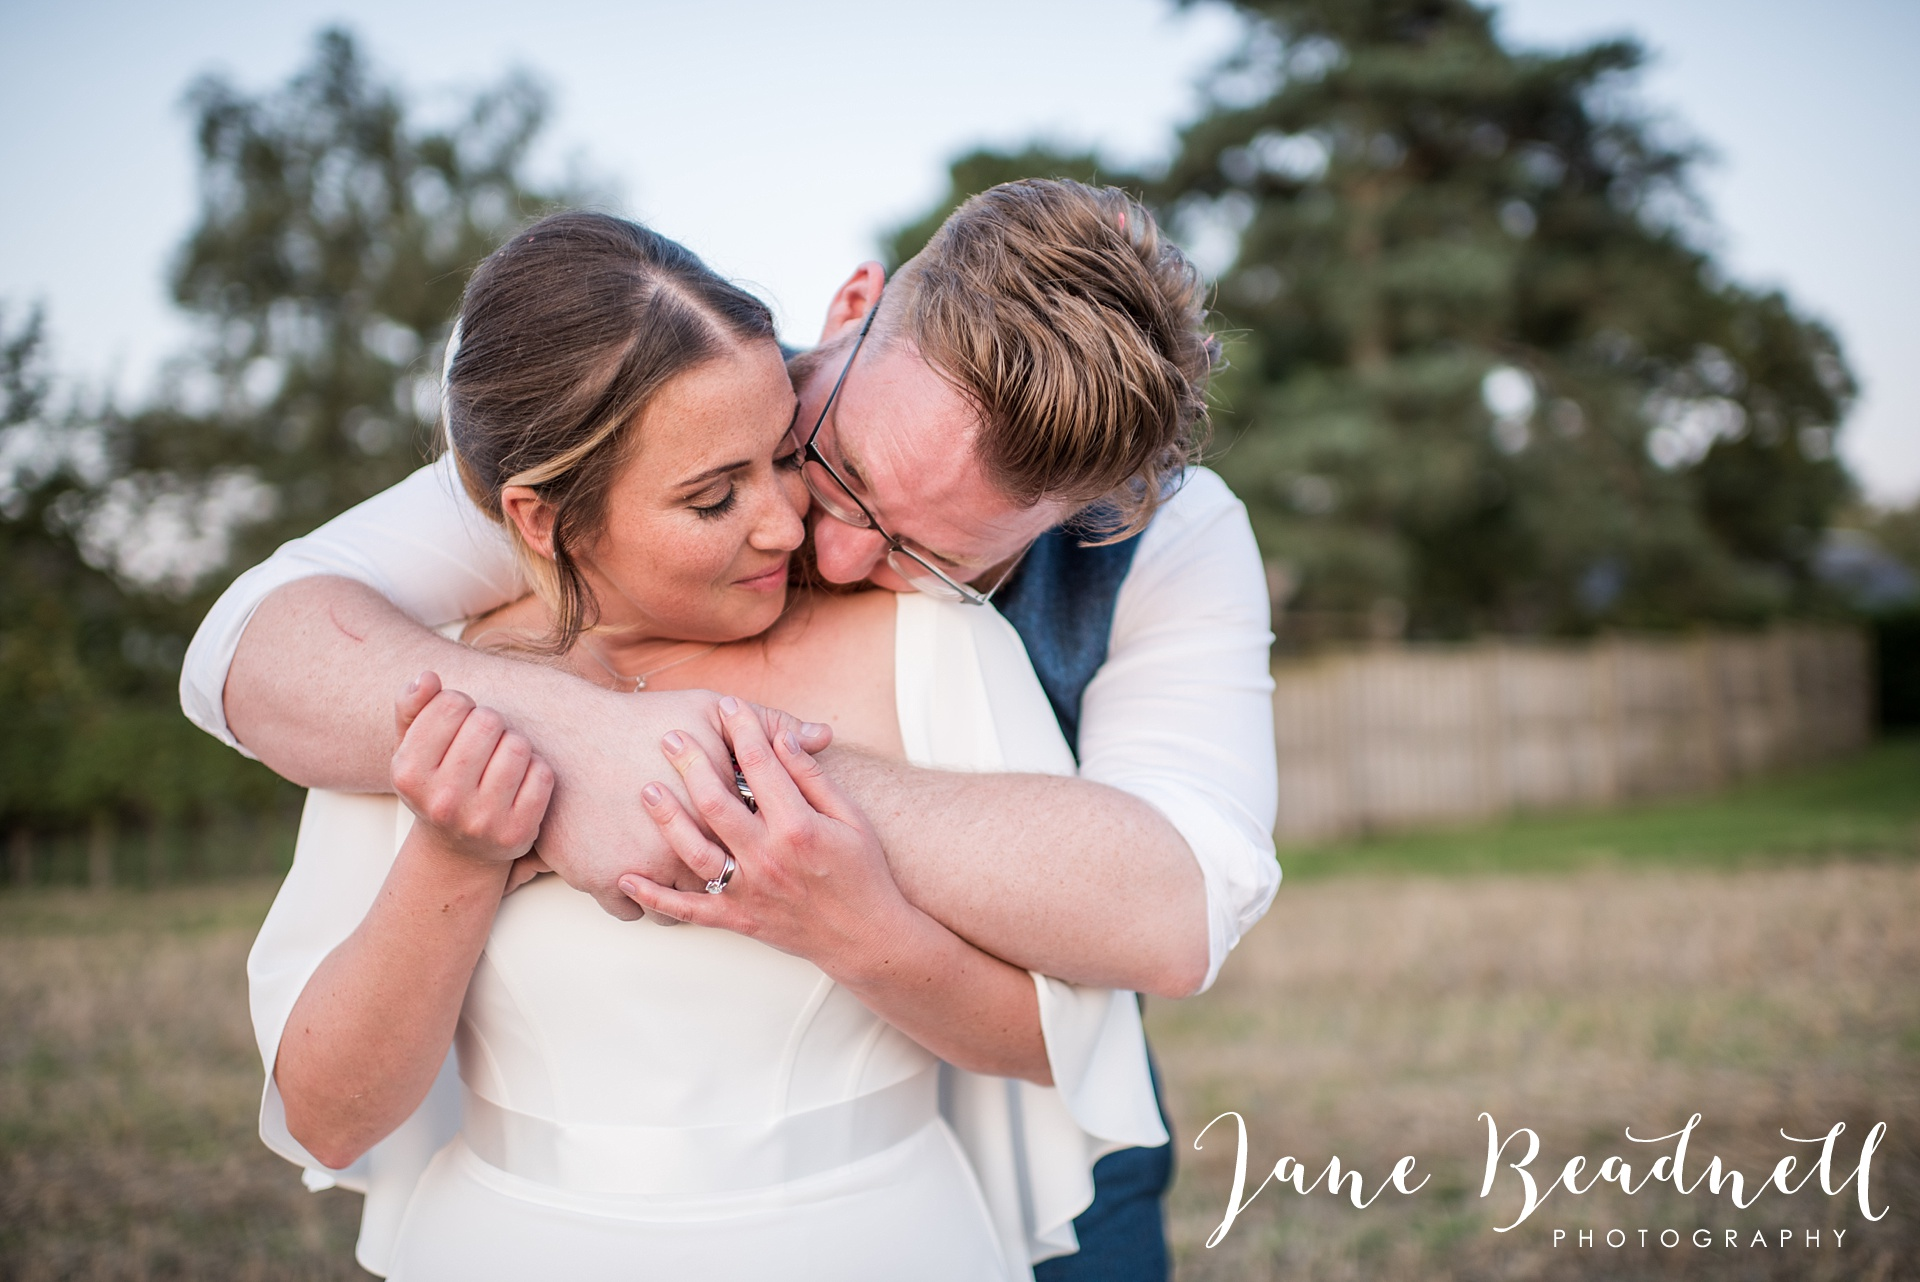 fine-art-wedding-photographer-jane-beadnell-yorkshire-wedding-photographer_0158